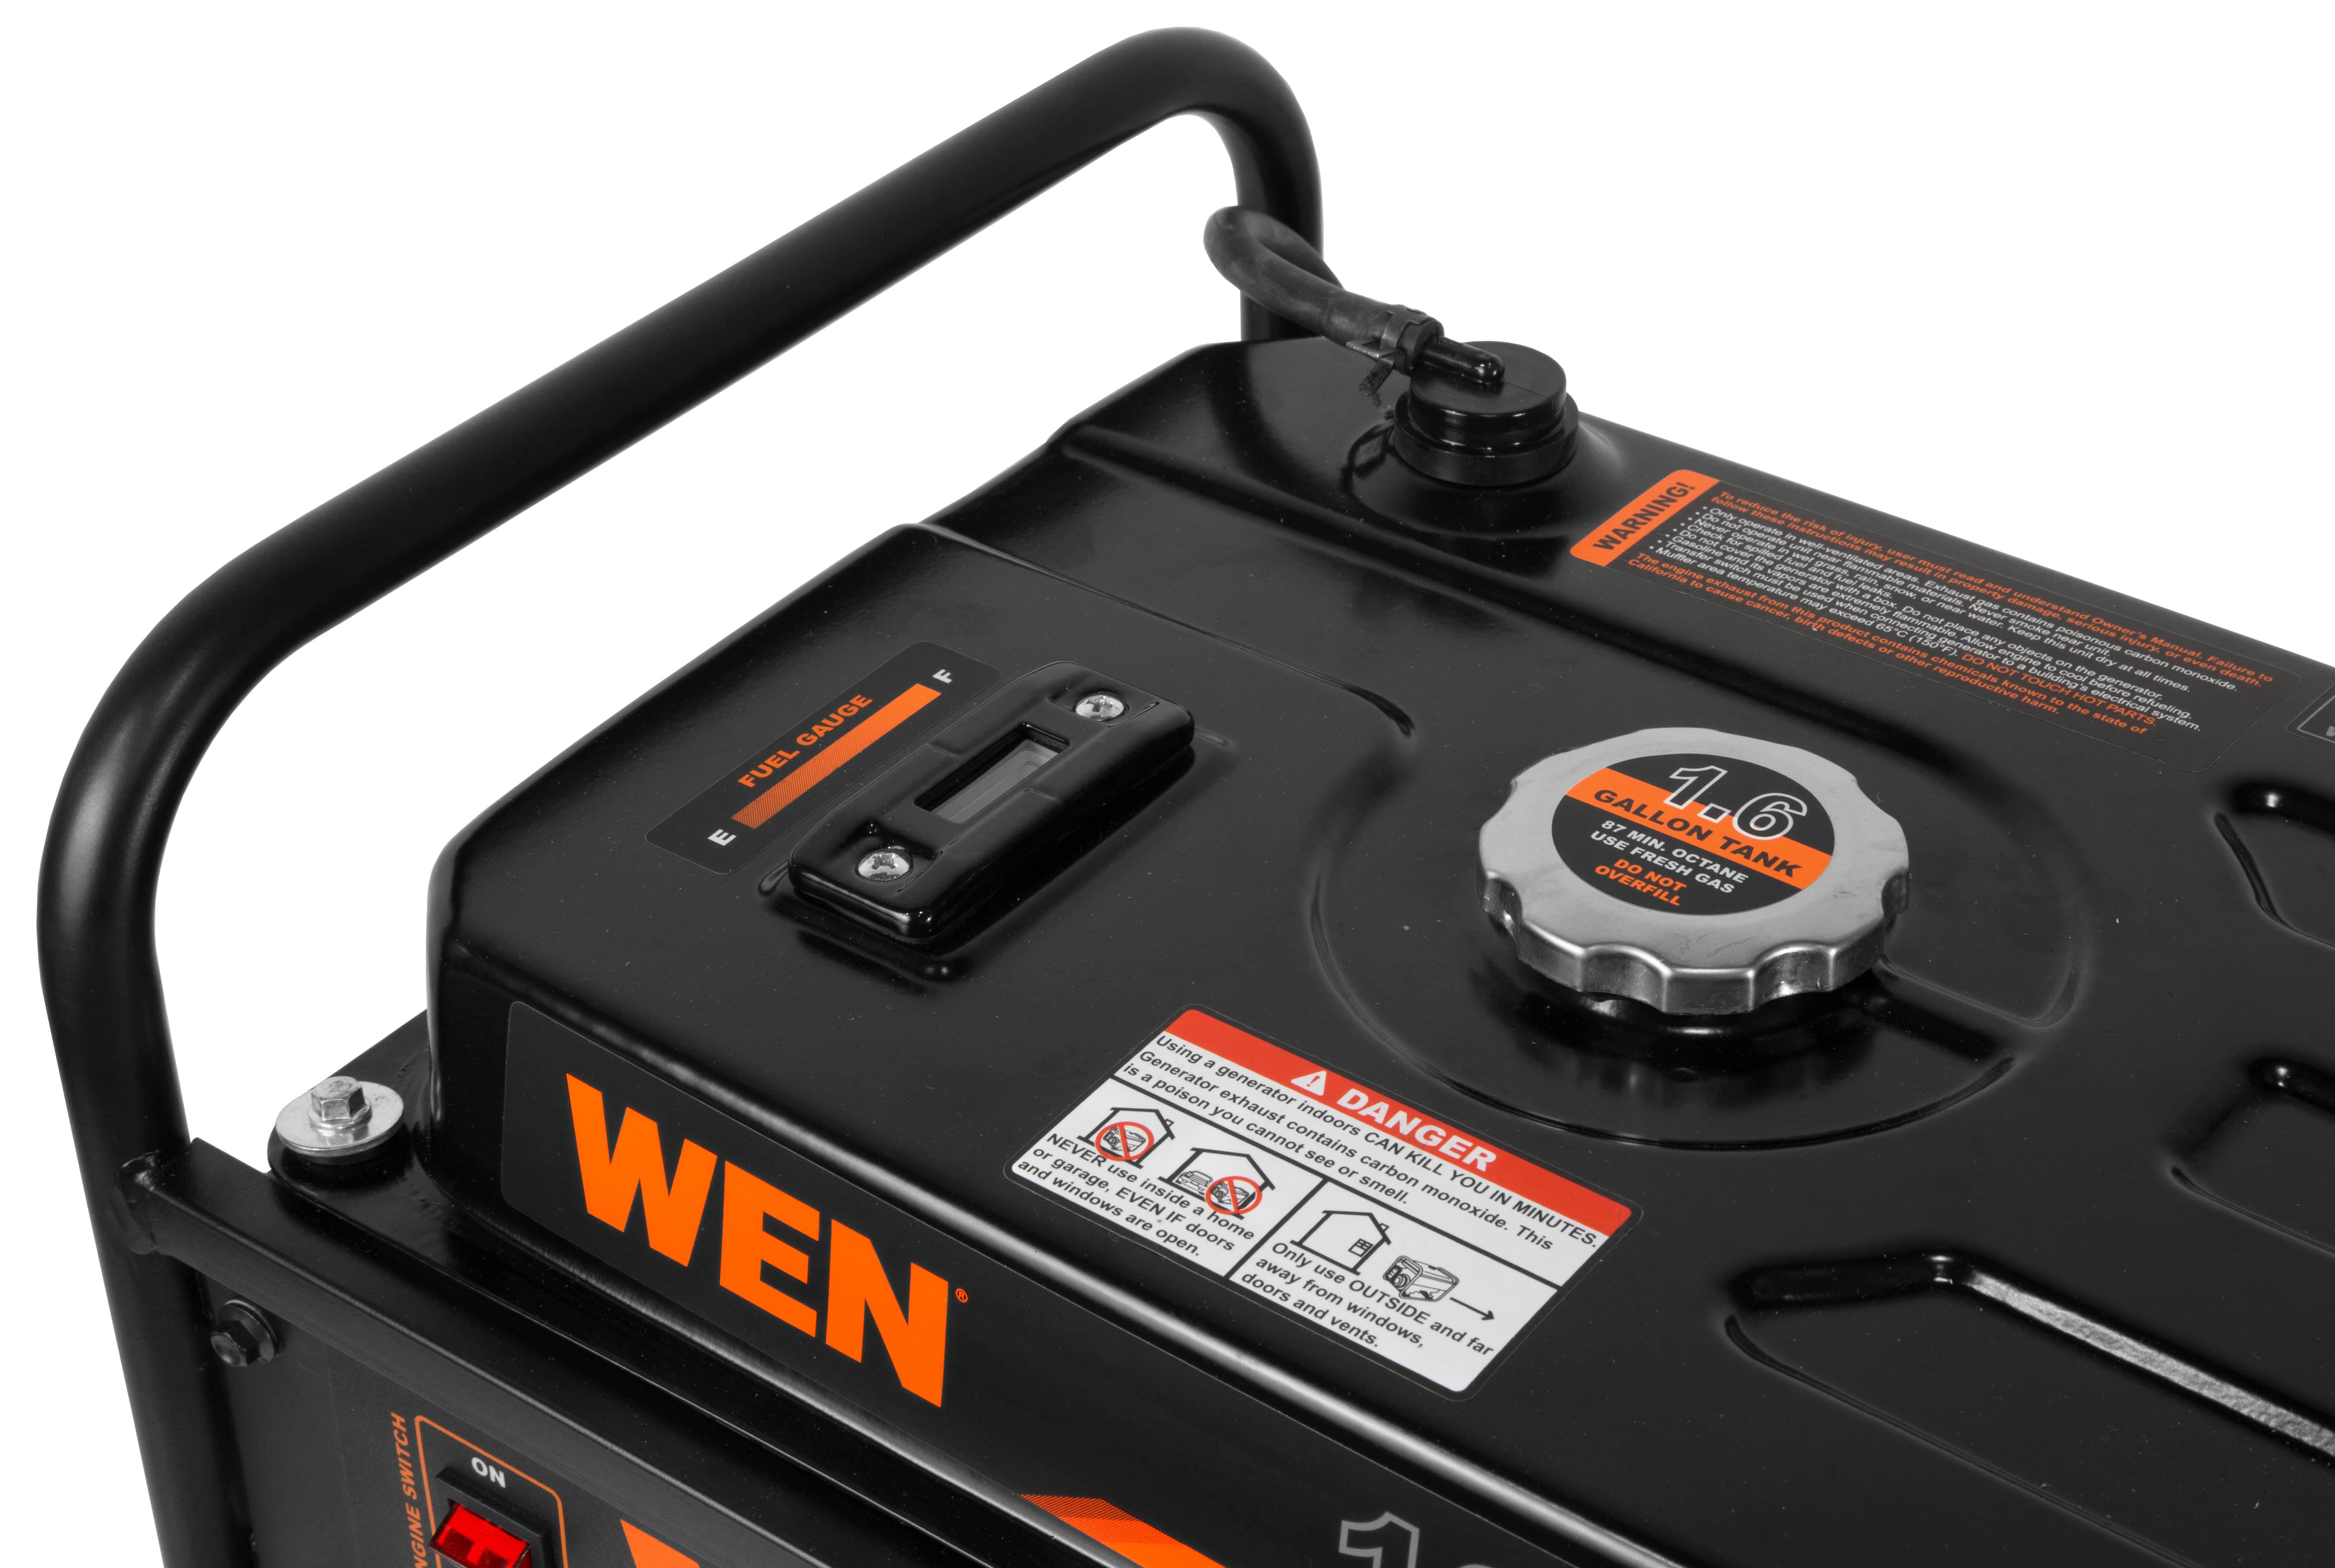 WEN 4-Stroke 98cc 1600-Watt Portable Generator, CARB Compliant